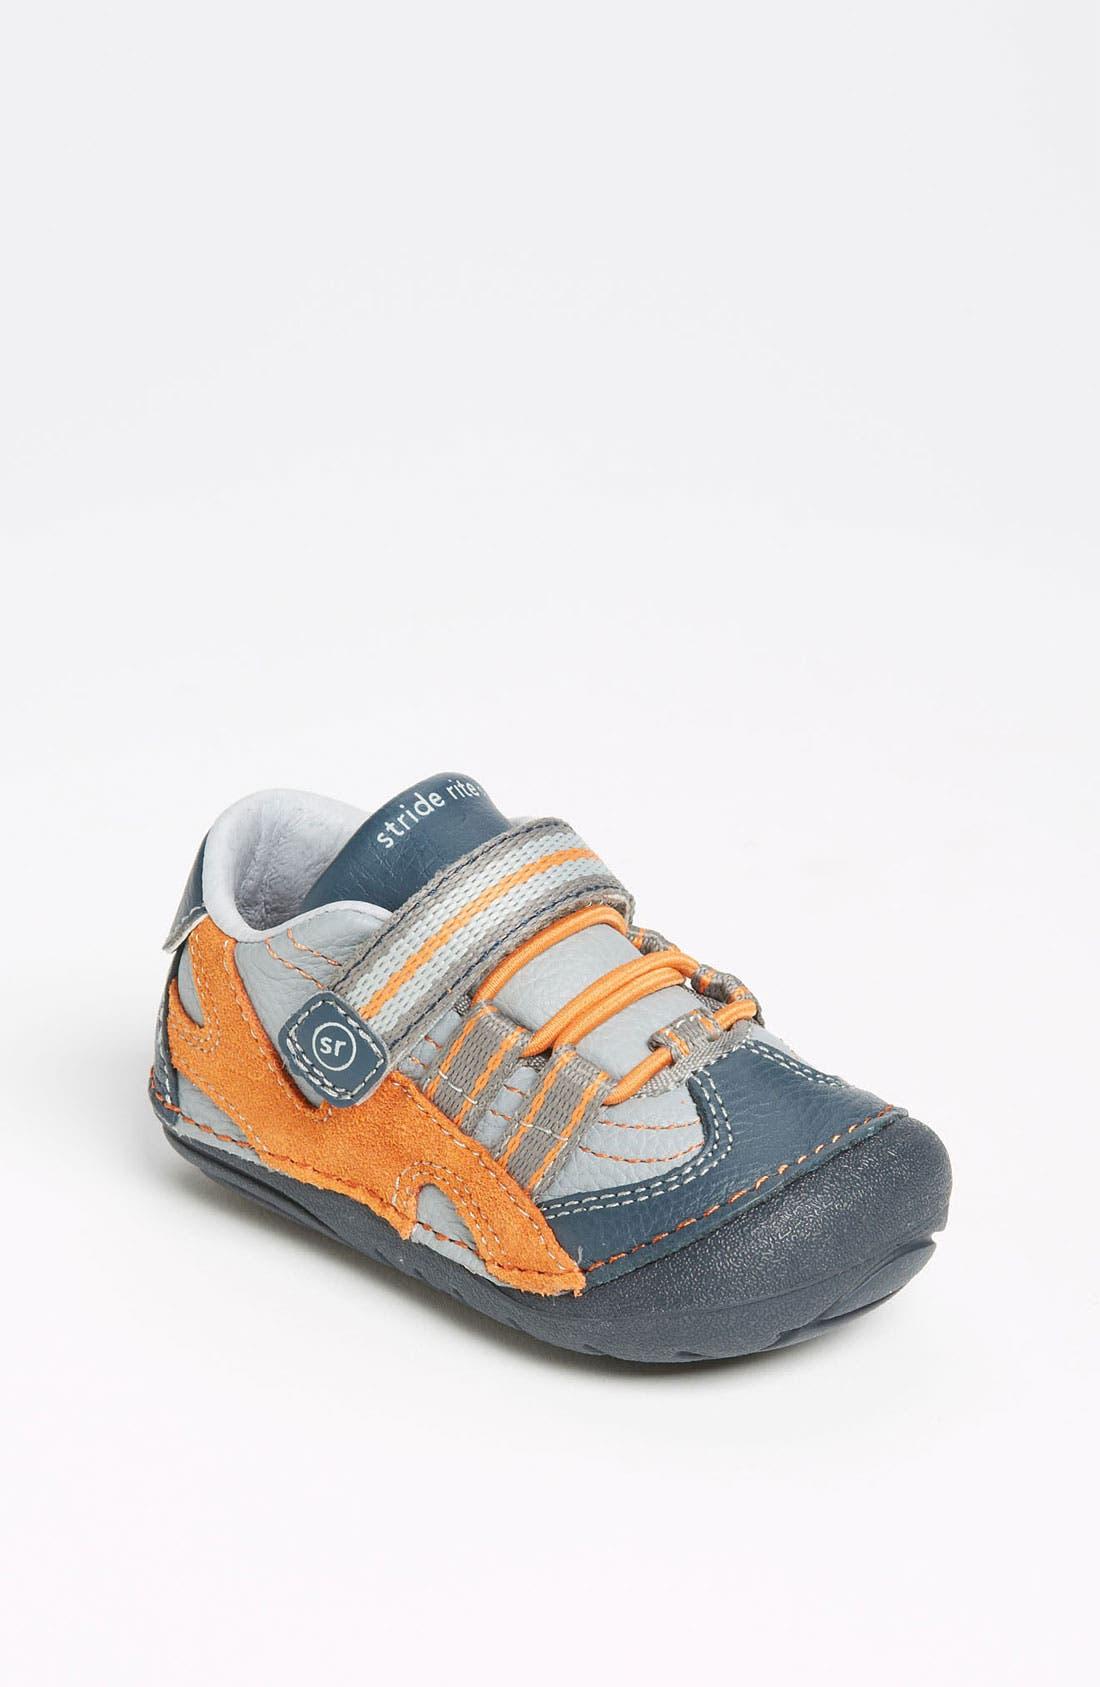 Main Image - Stride Rite 'Leo' Sneaker (Baby & Walker)